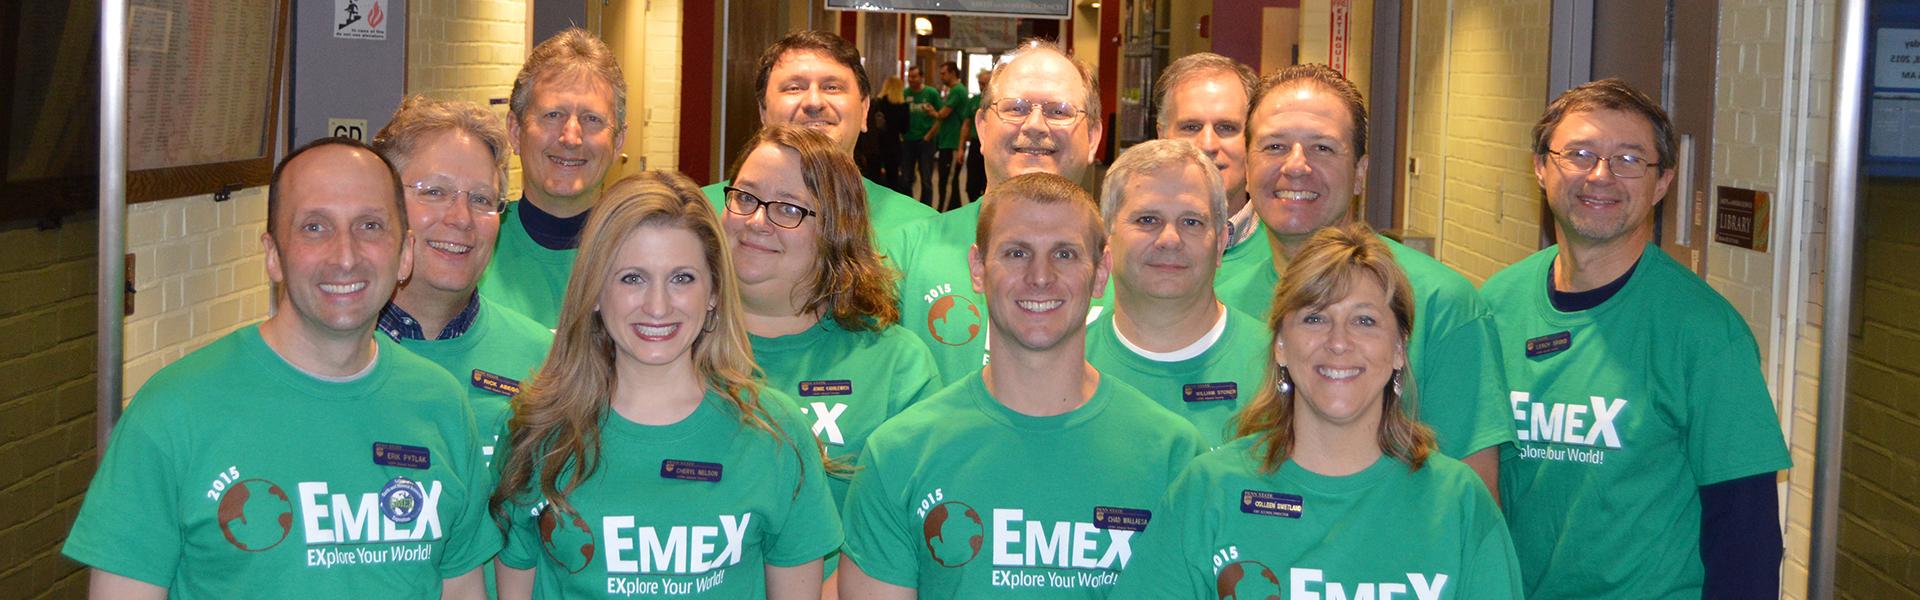 GEMS at EMEX